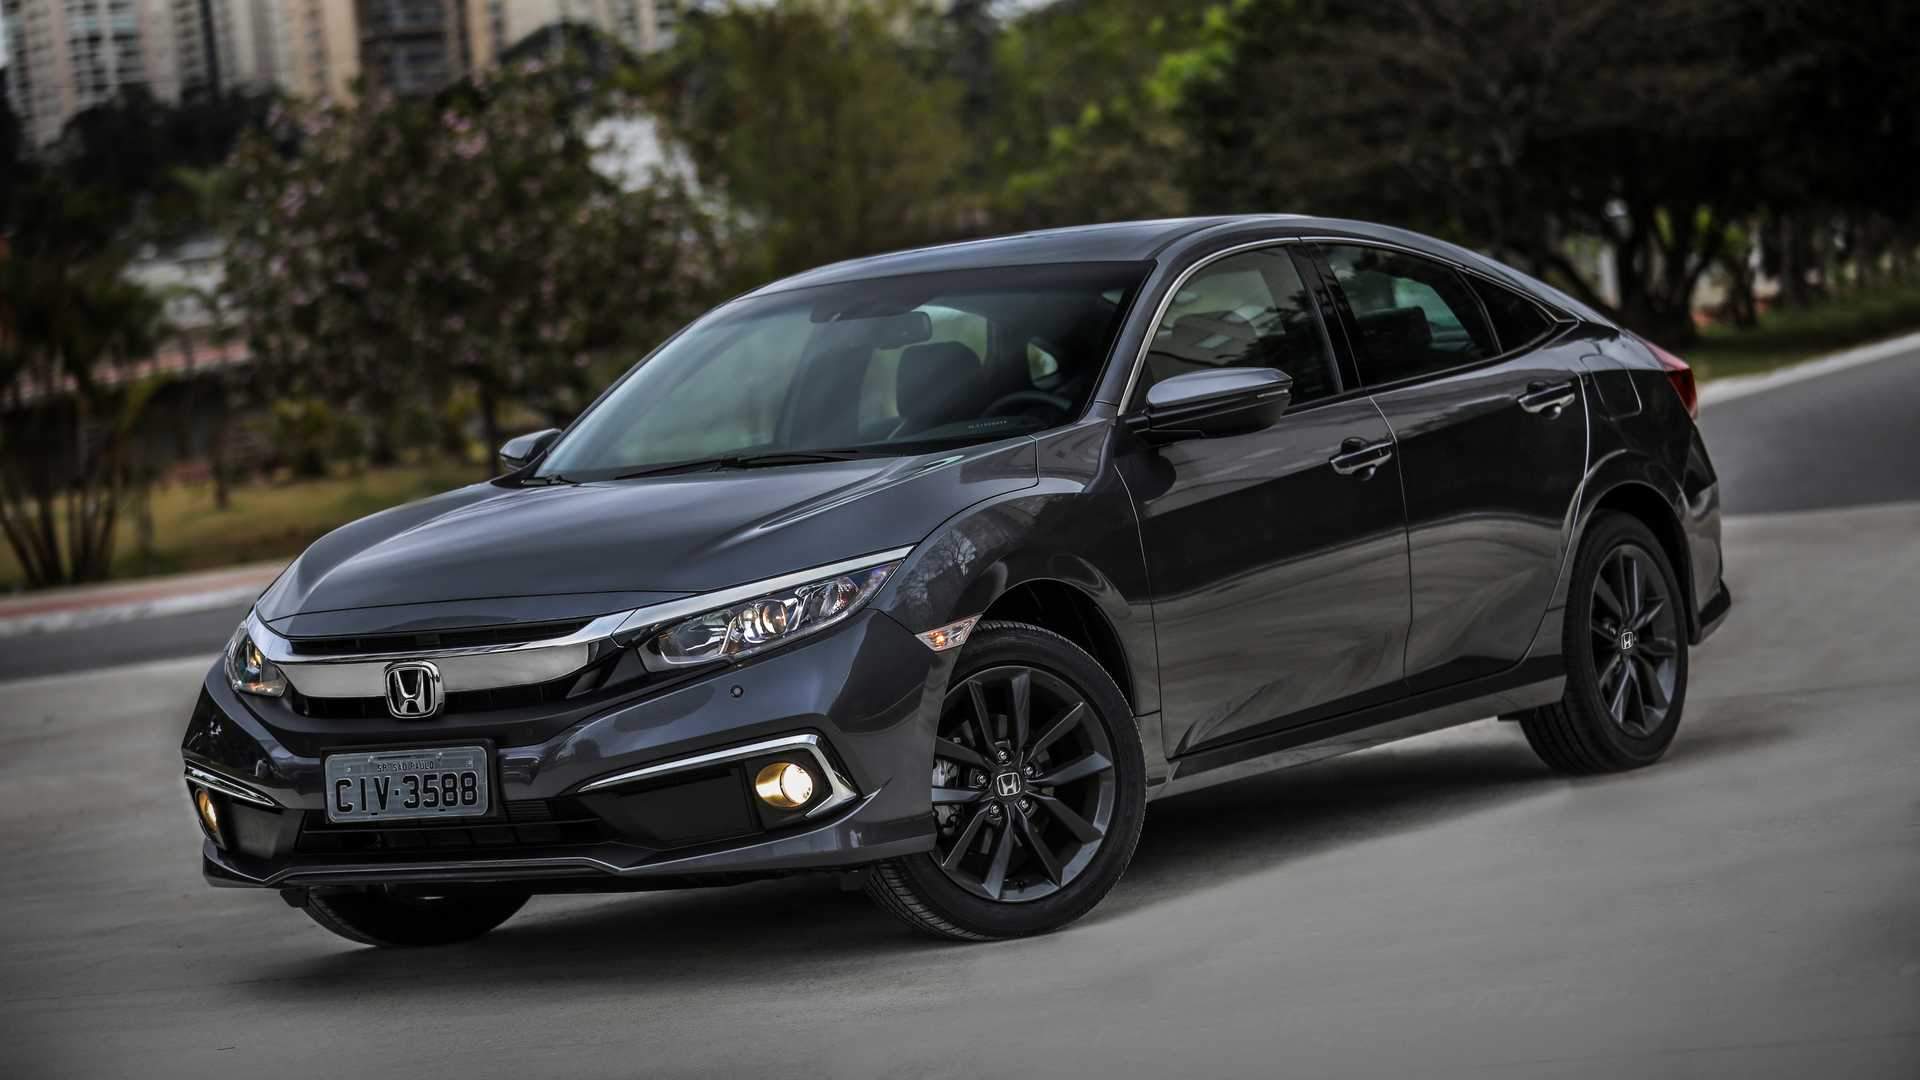 Honda Civic 2020 Exterior